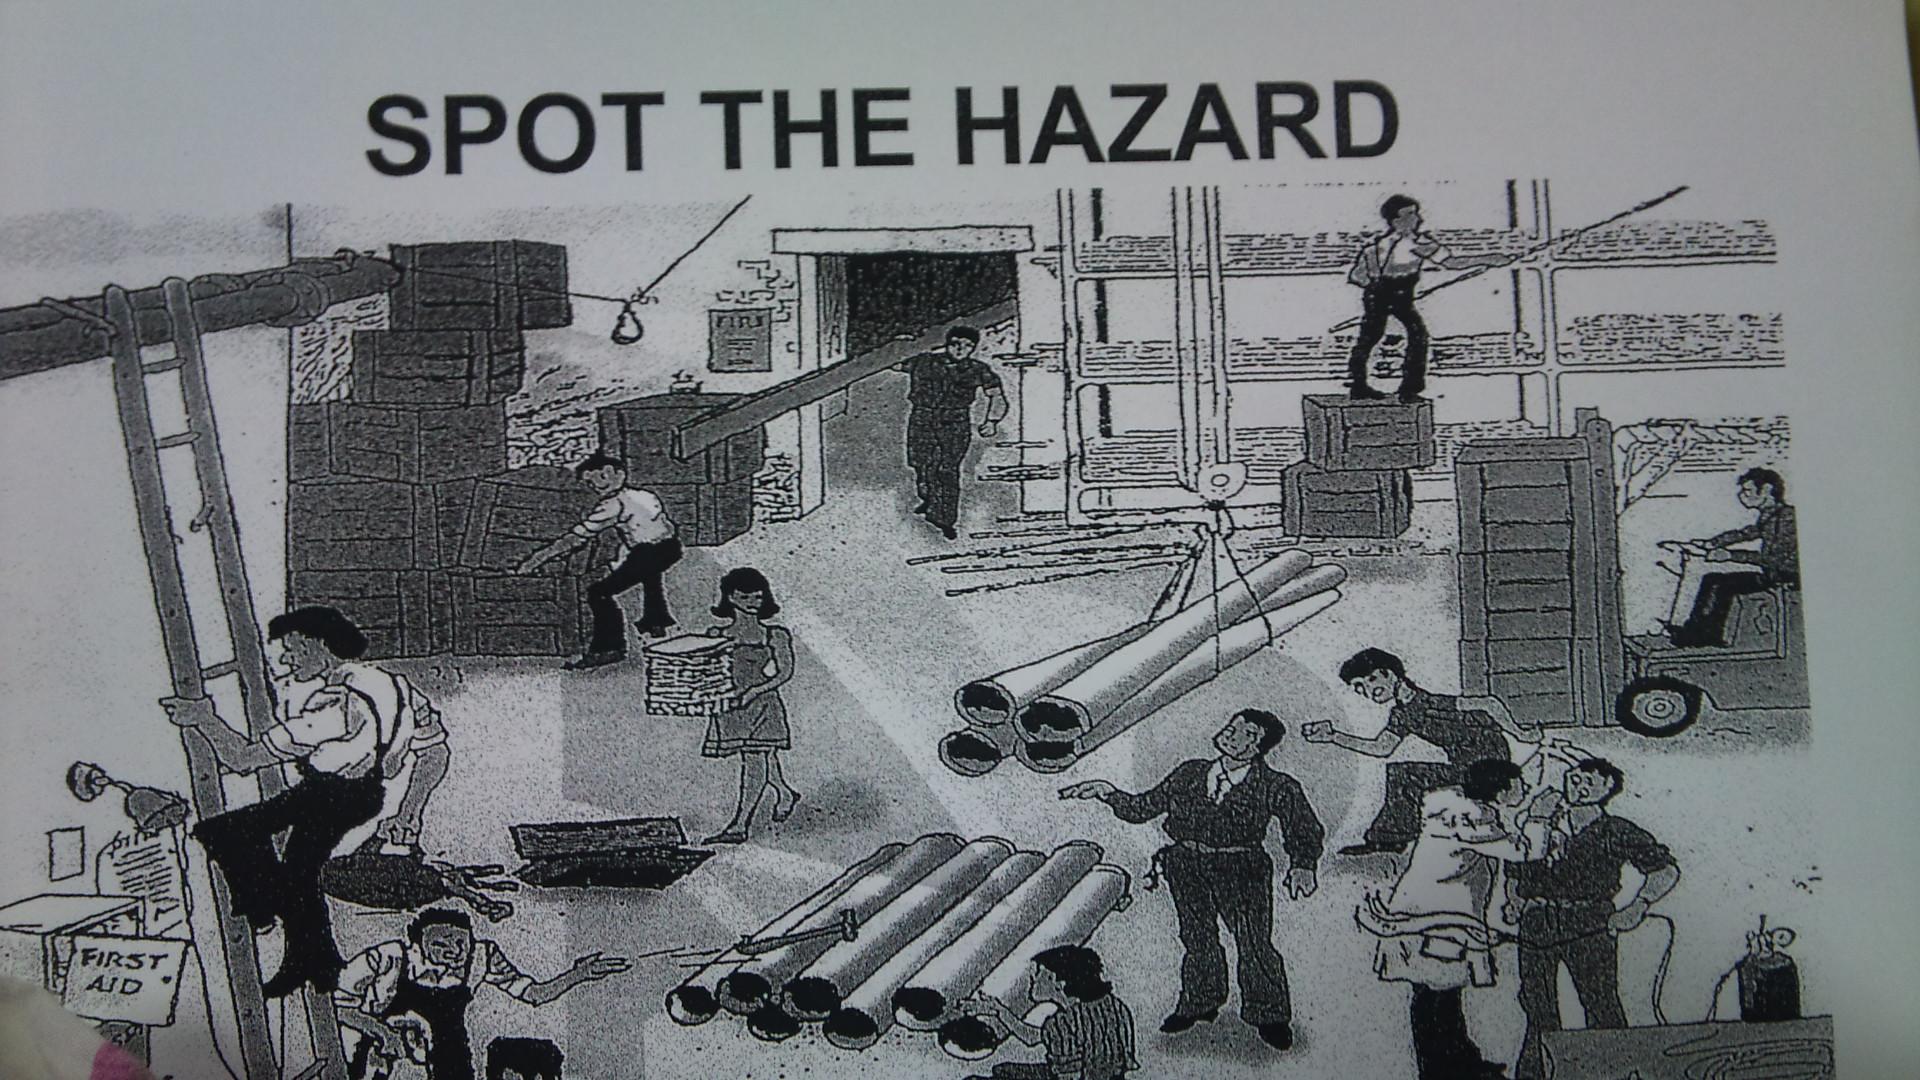 Spot The Hazard